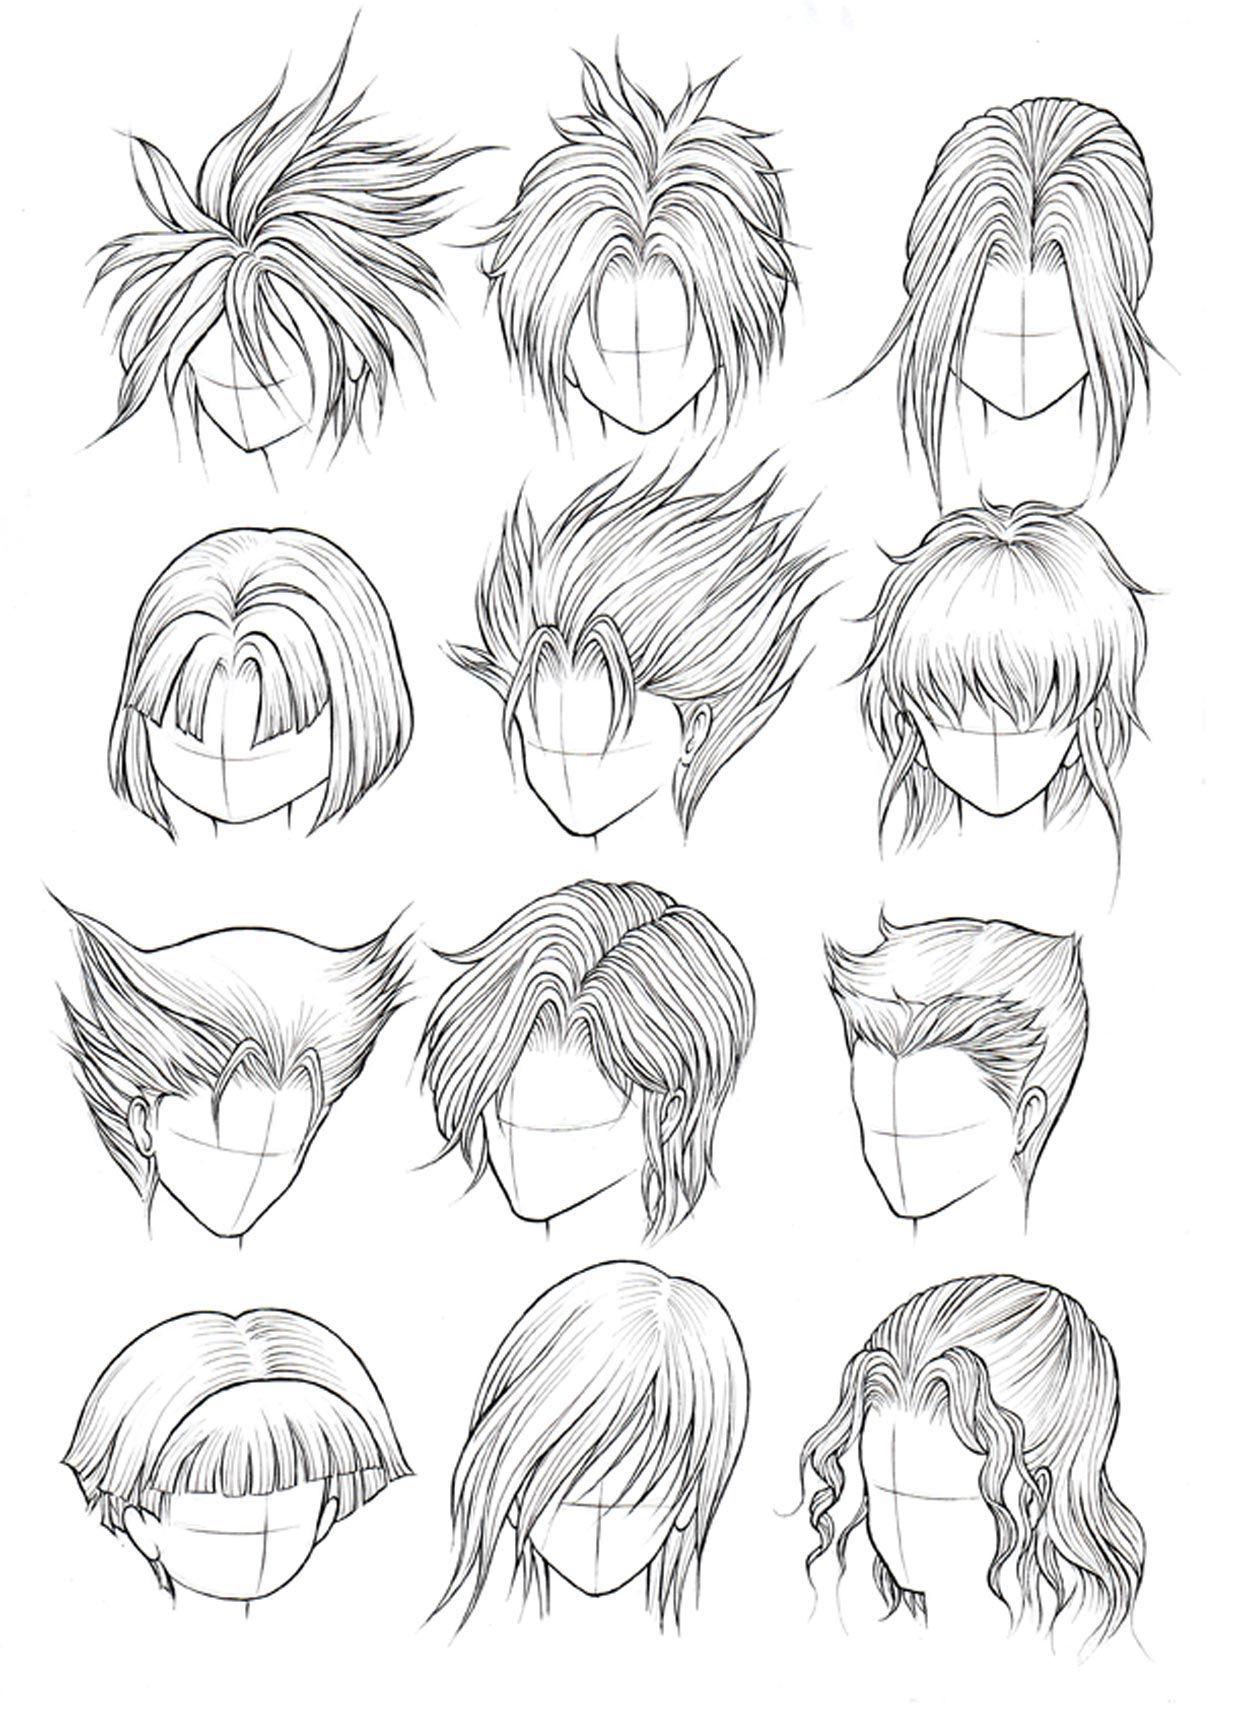 anime hair drawing: Kanji De Manga Vol 3 Cover Image